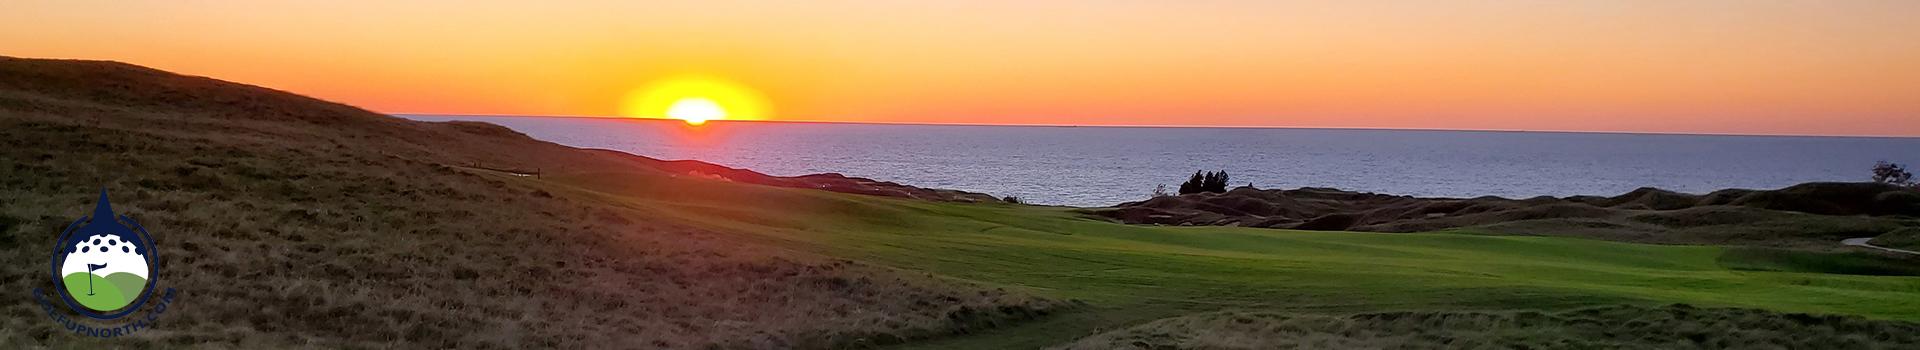 Golf Up North